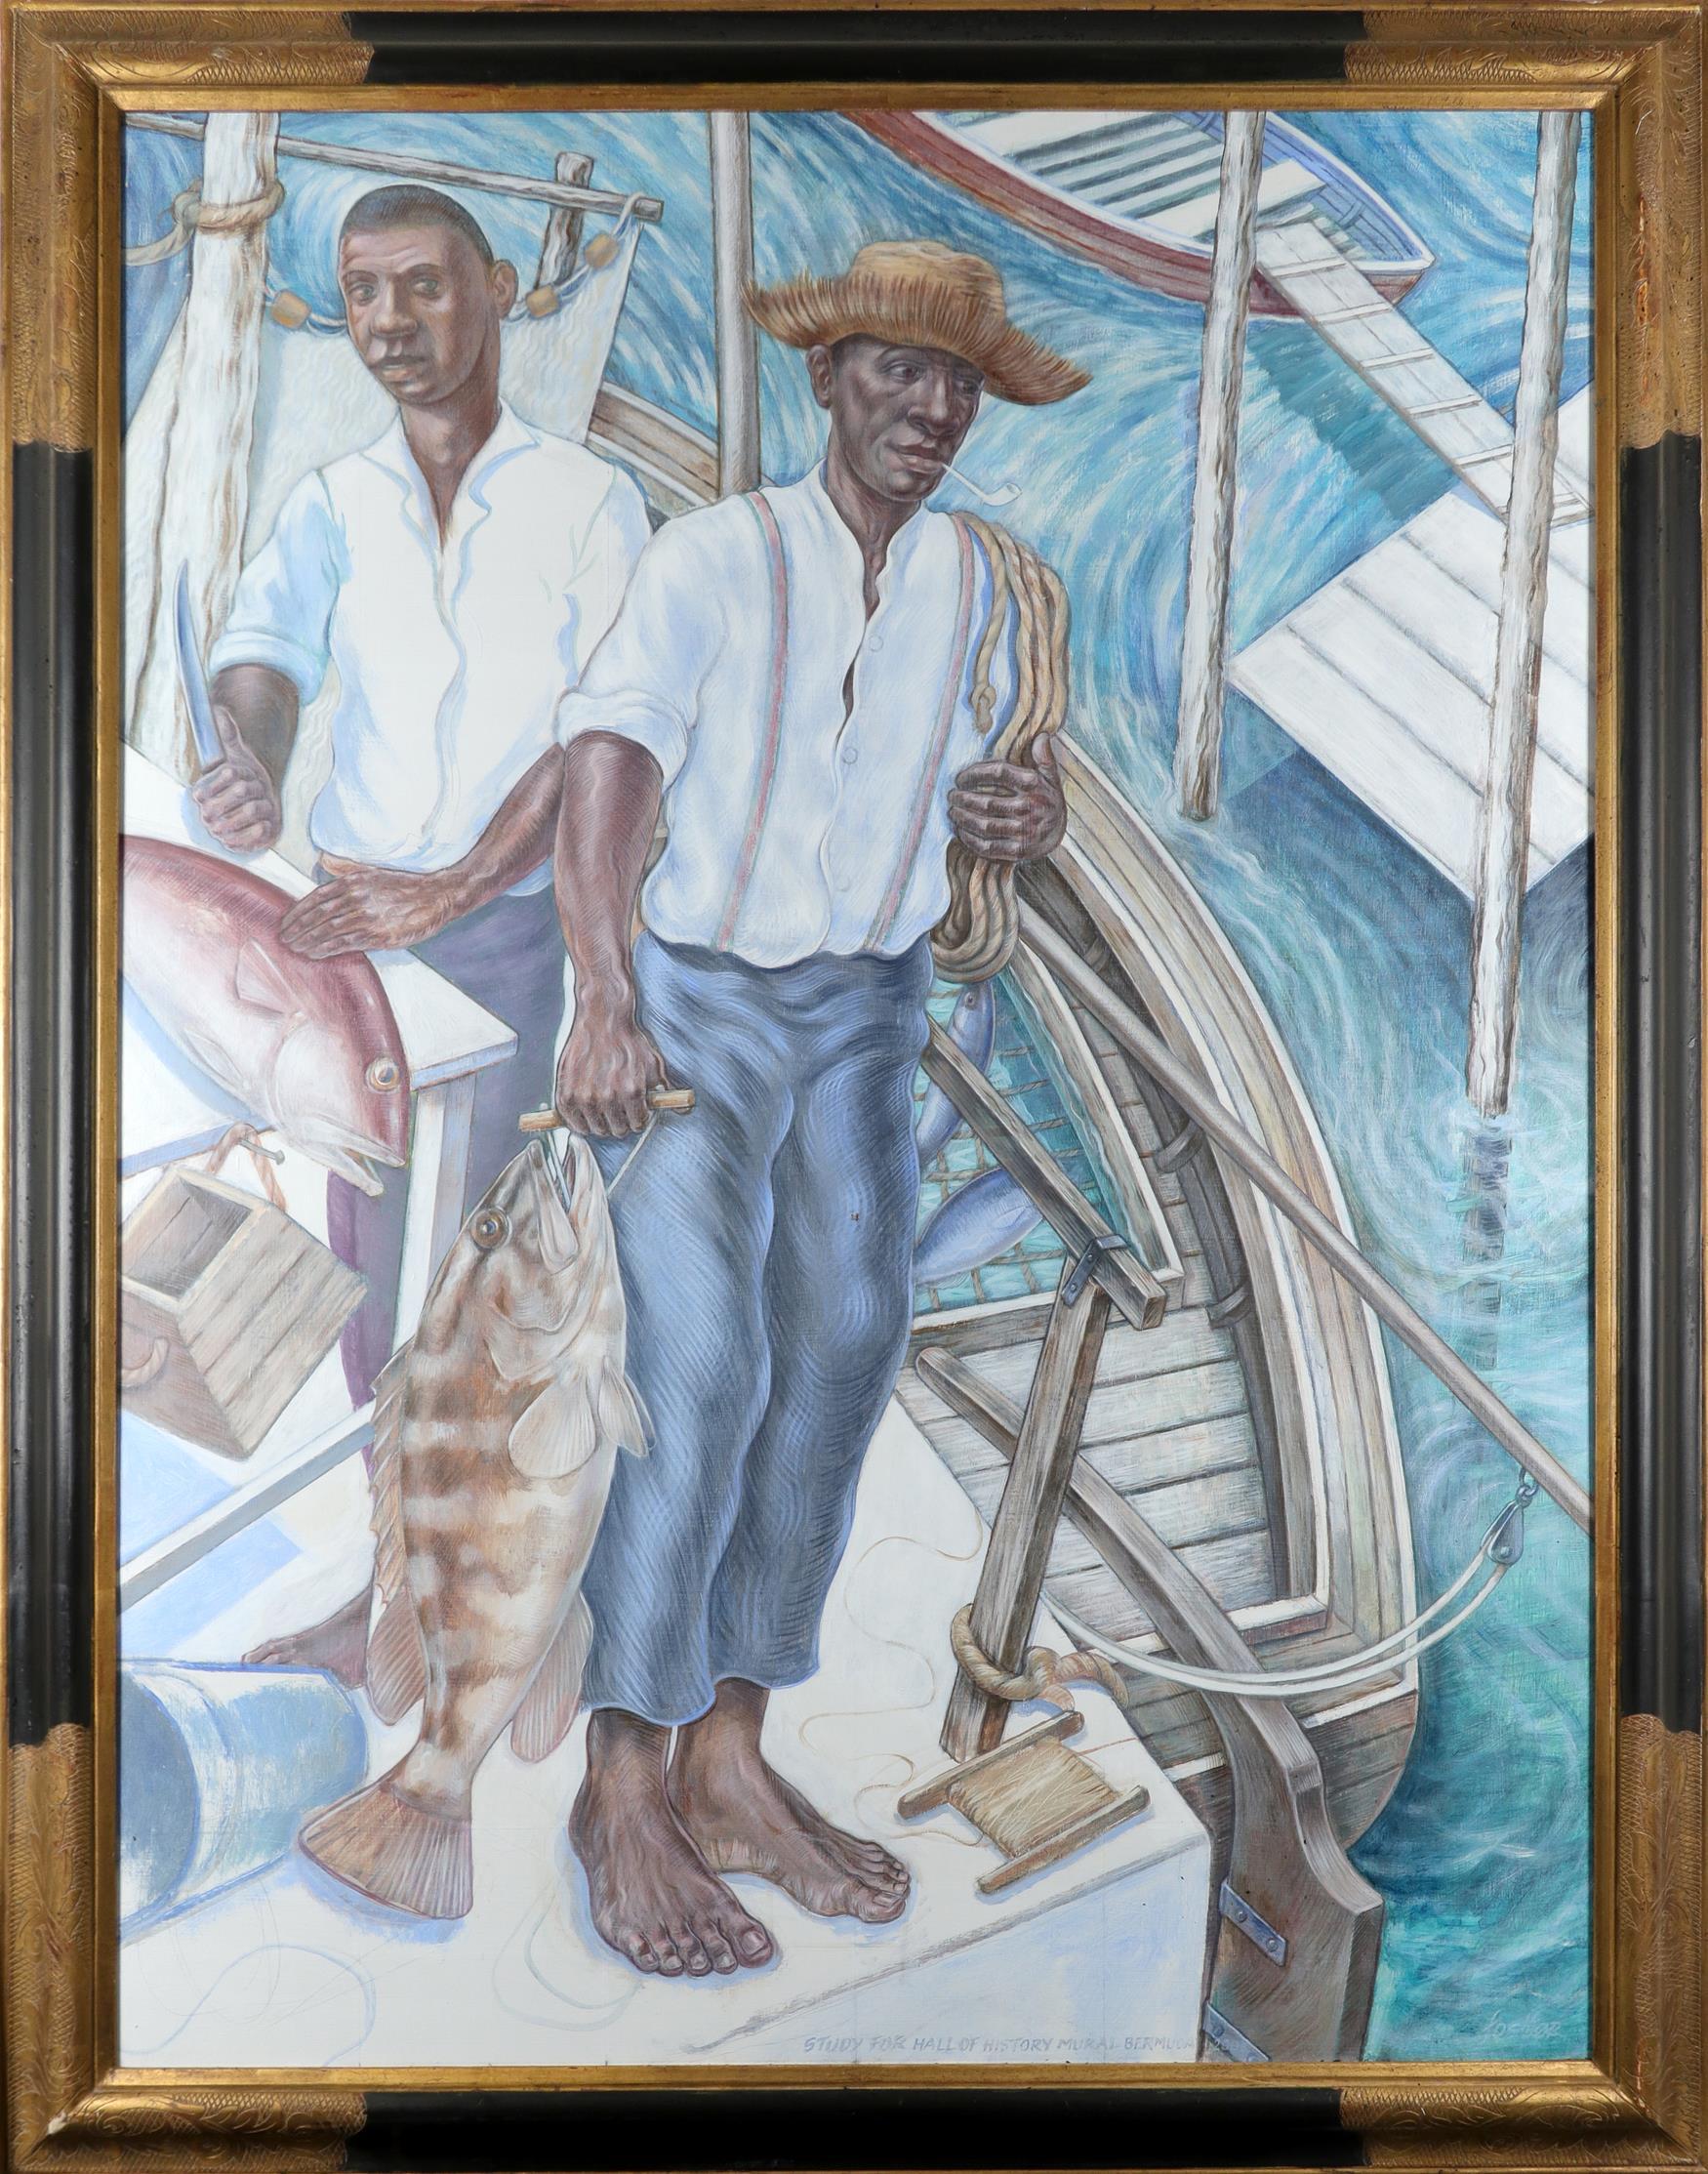 Graham Foster (Bermudan b.1970) Fishermen and Hamlet: Study for the Hall of History Mural, Bermuda - Image 2 of 3